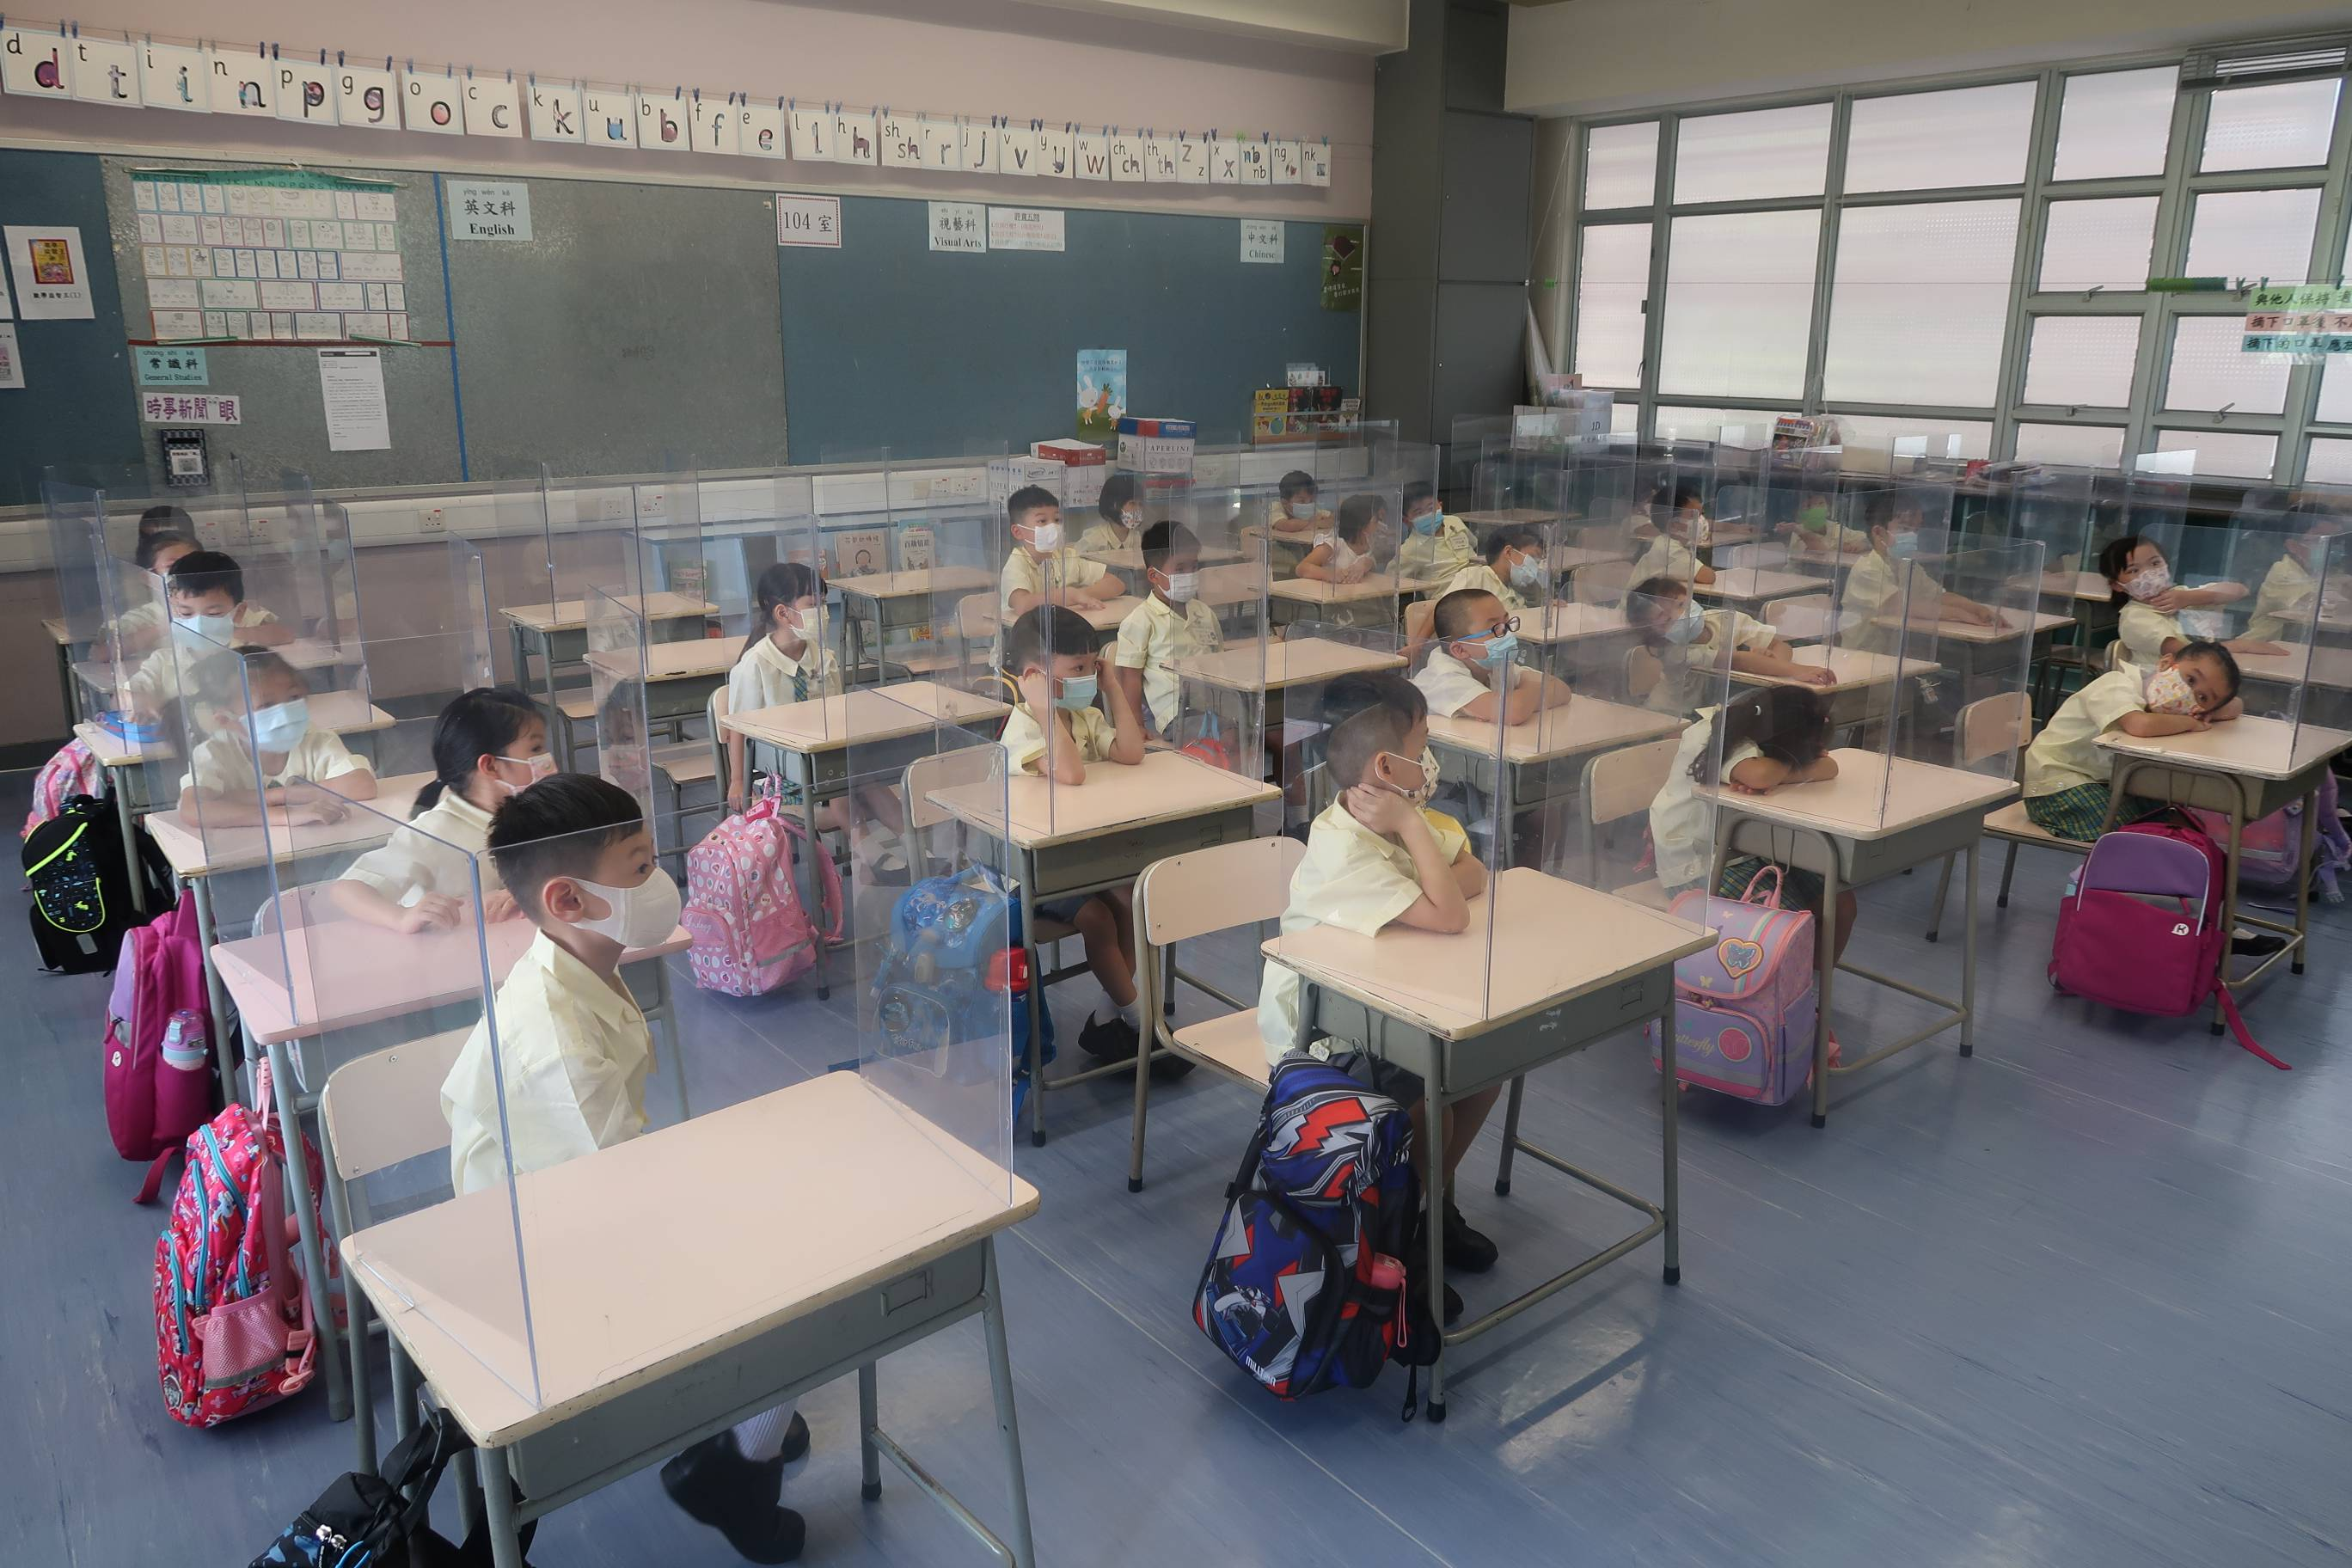 https://syh.edu.hk/sites/default/files/img_6699_1.jpg